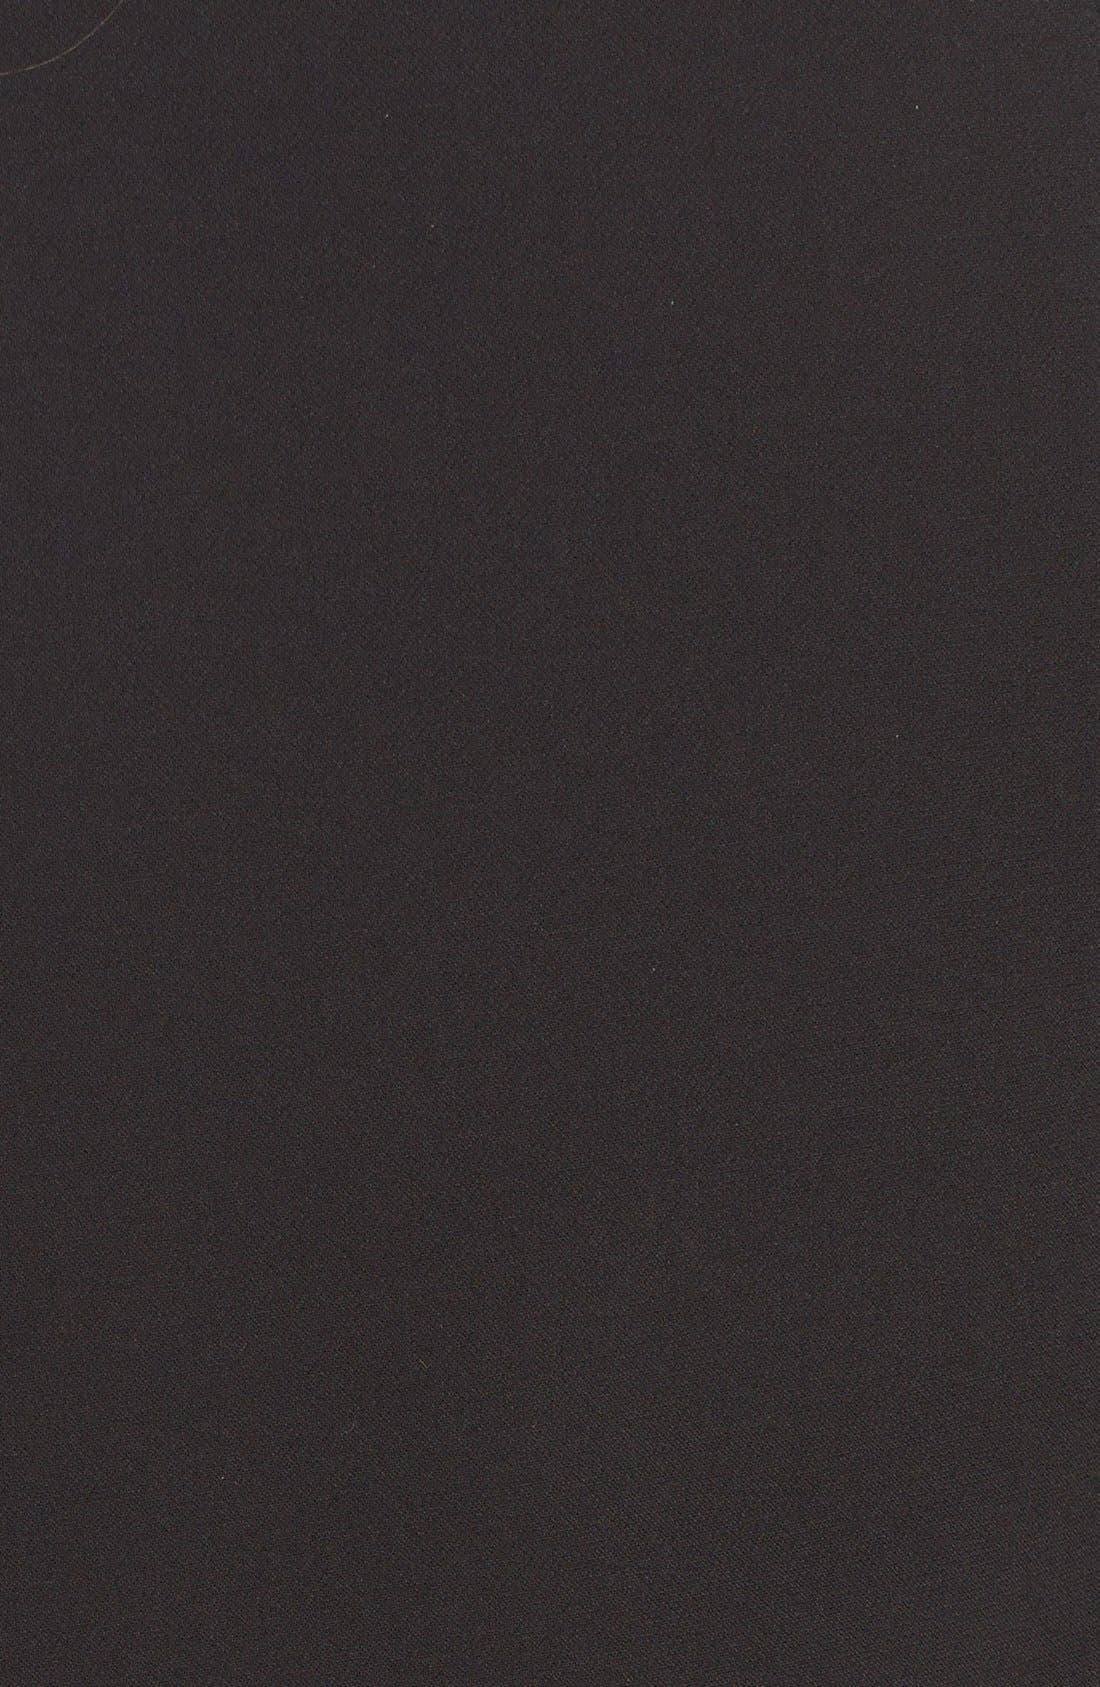 Alternate Image 2  - TrinaTurk'Gizela'Cape Back Dress